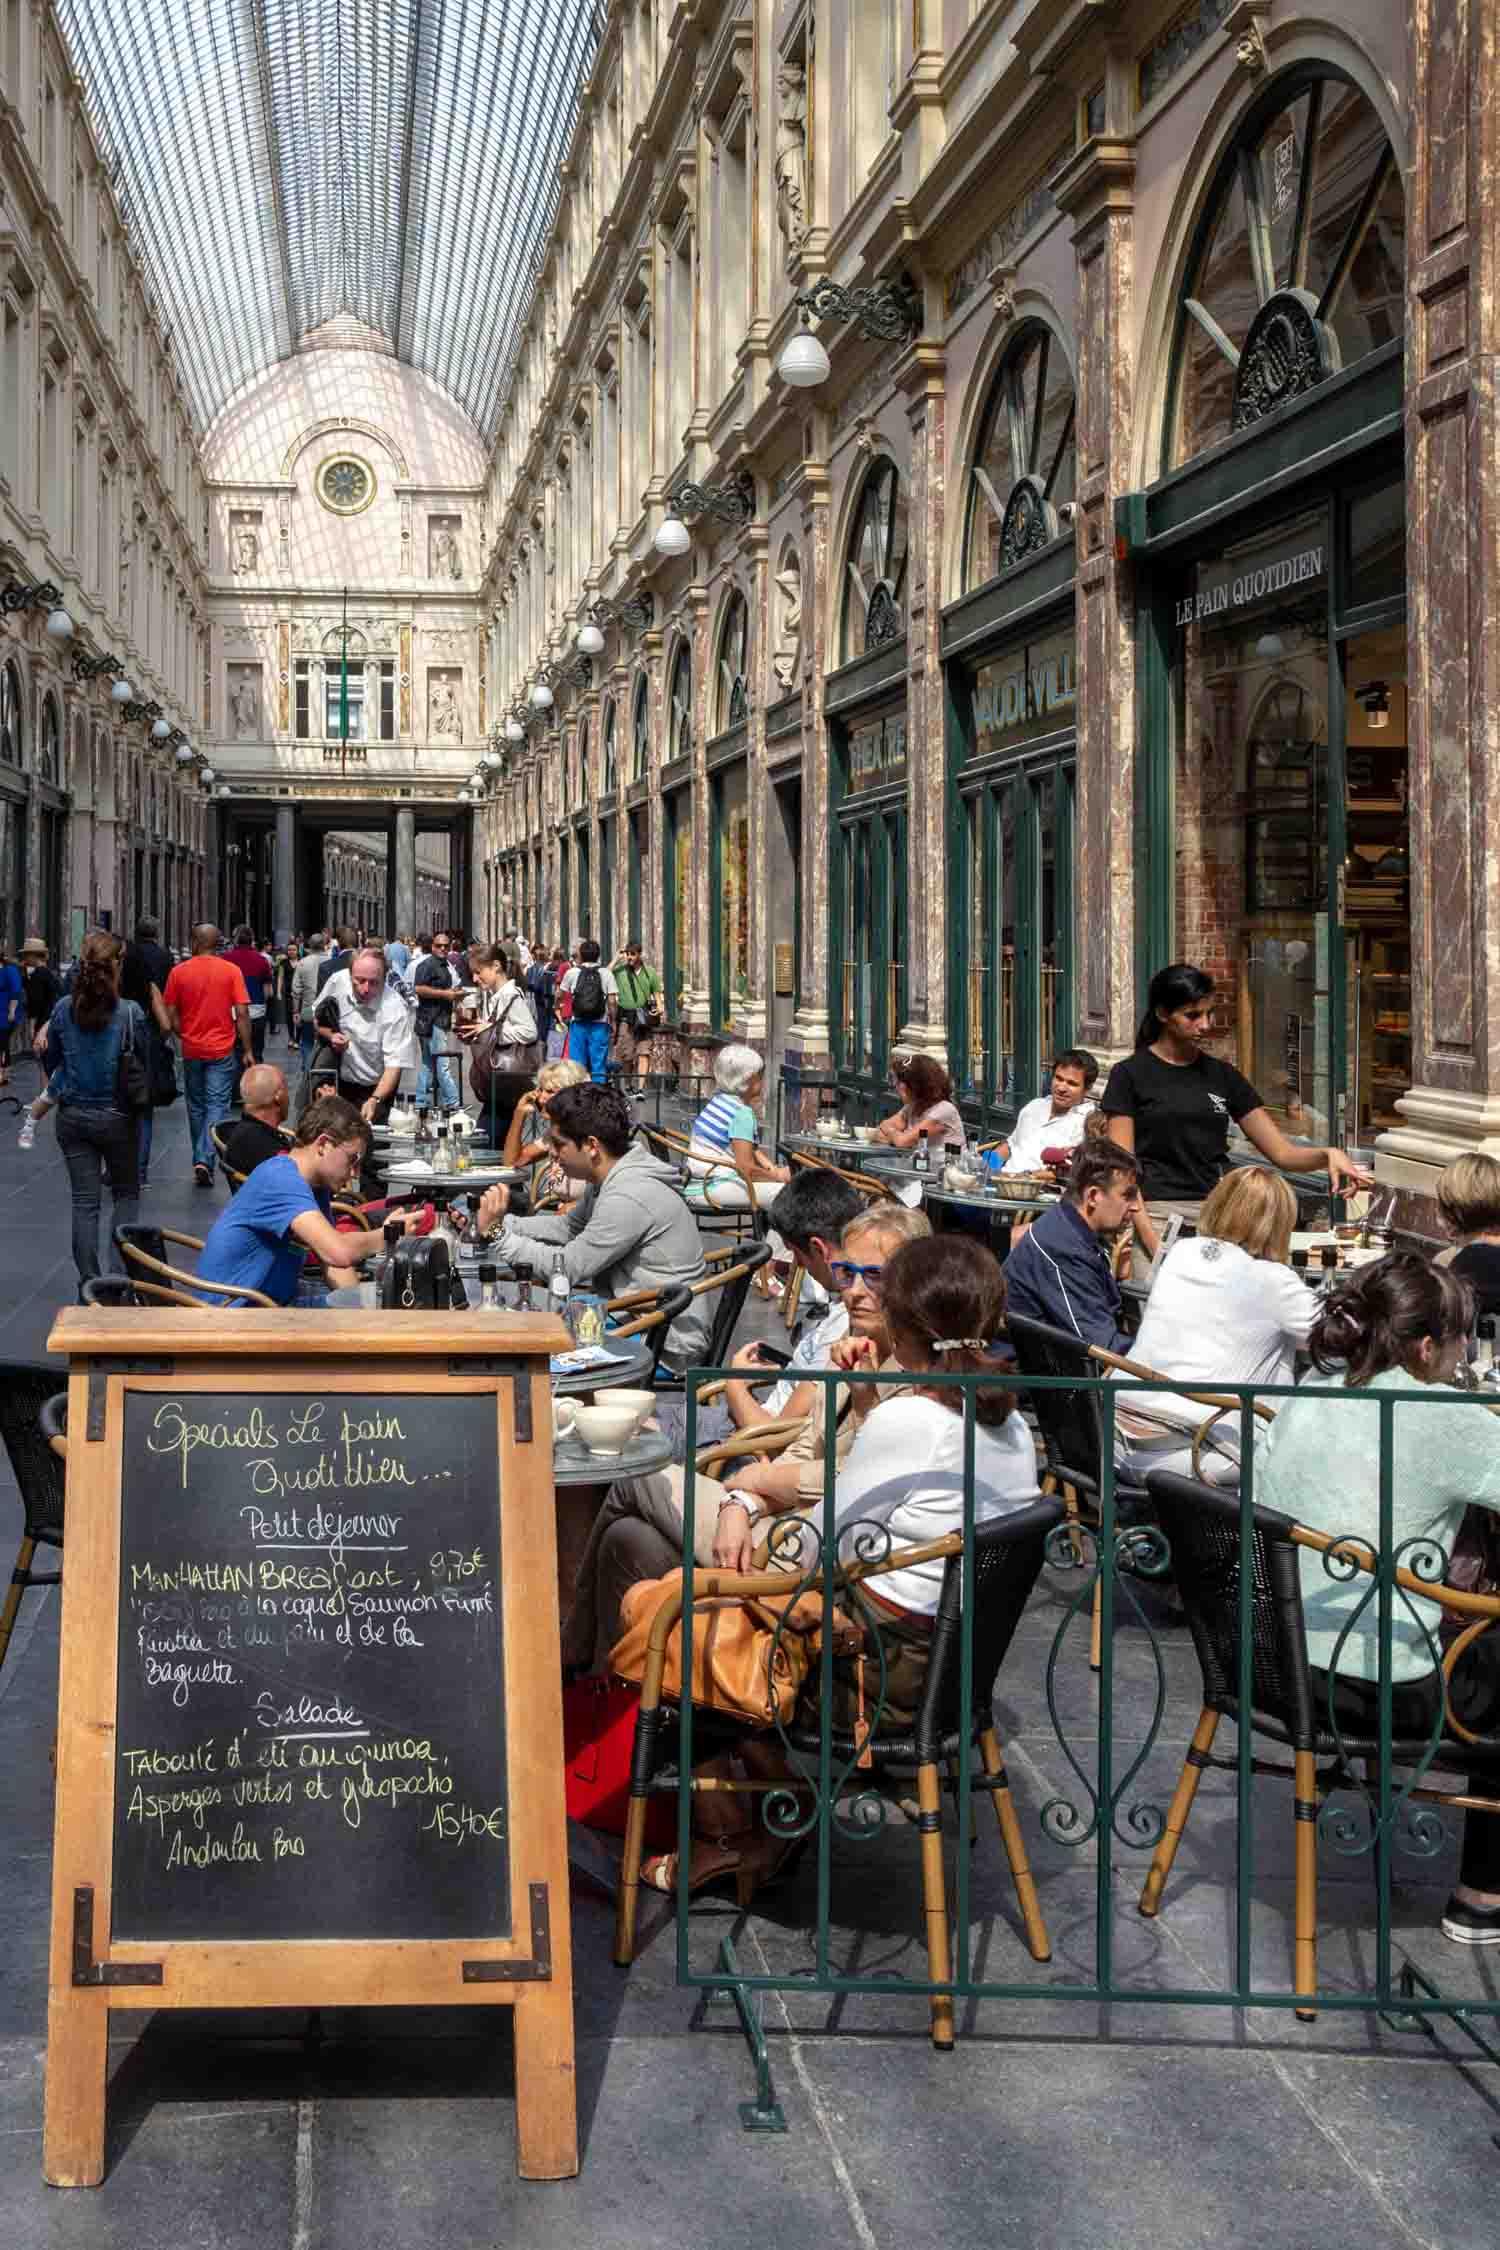 Brussels restaurant alleyway